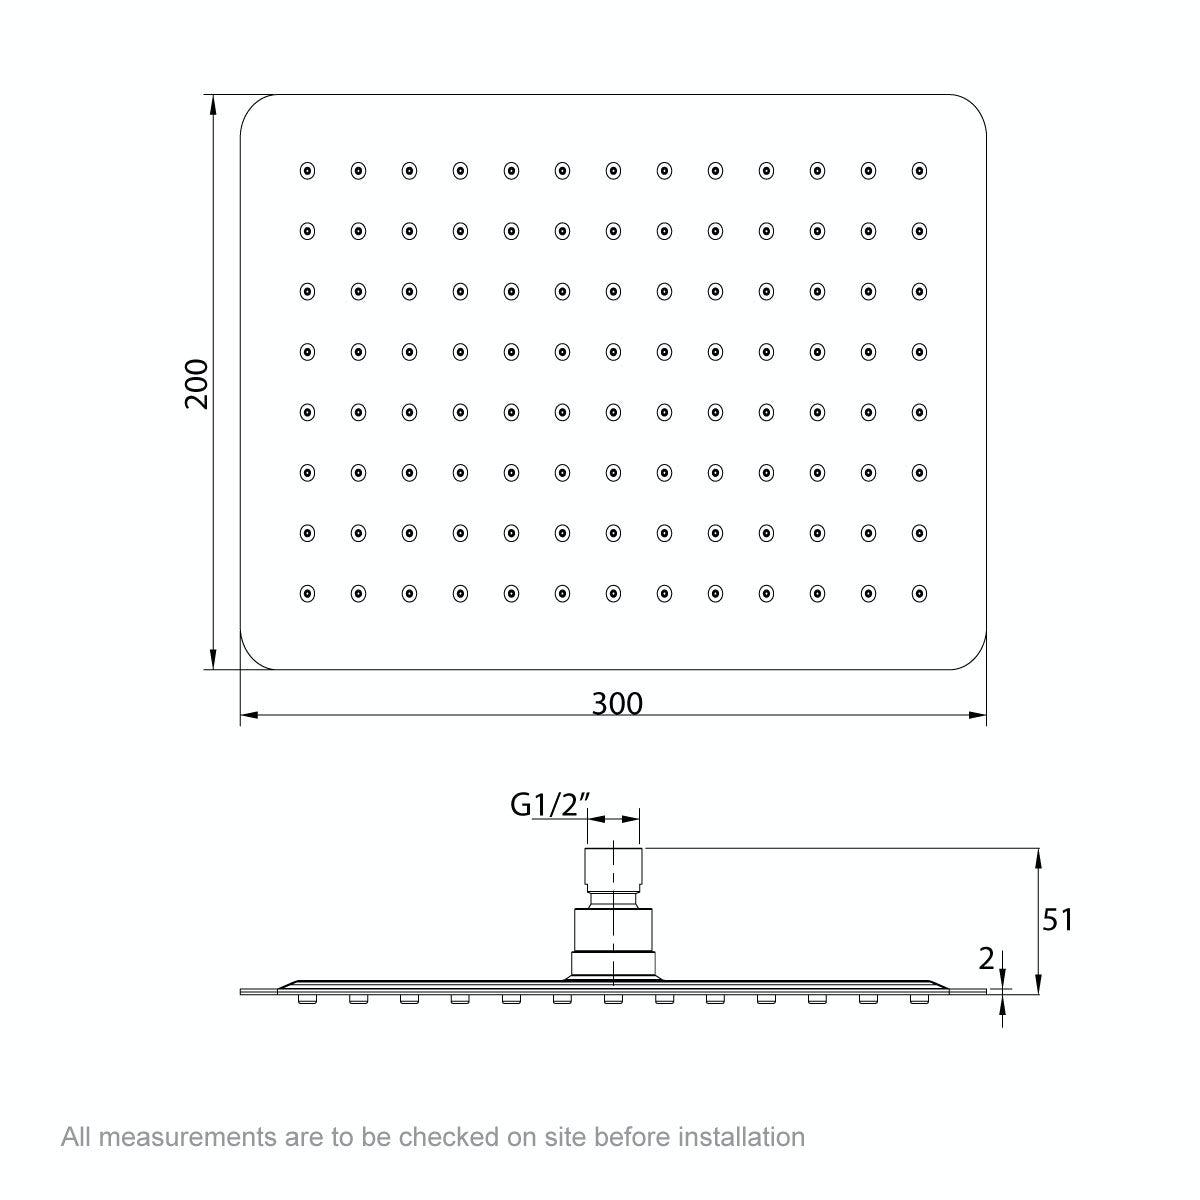 Dimensions for Mode Renzo rectangular slim stainless steel shower head 300mm